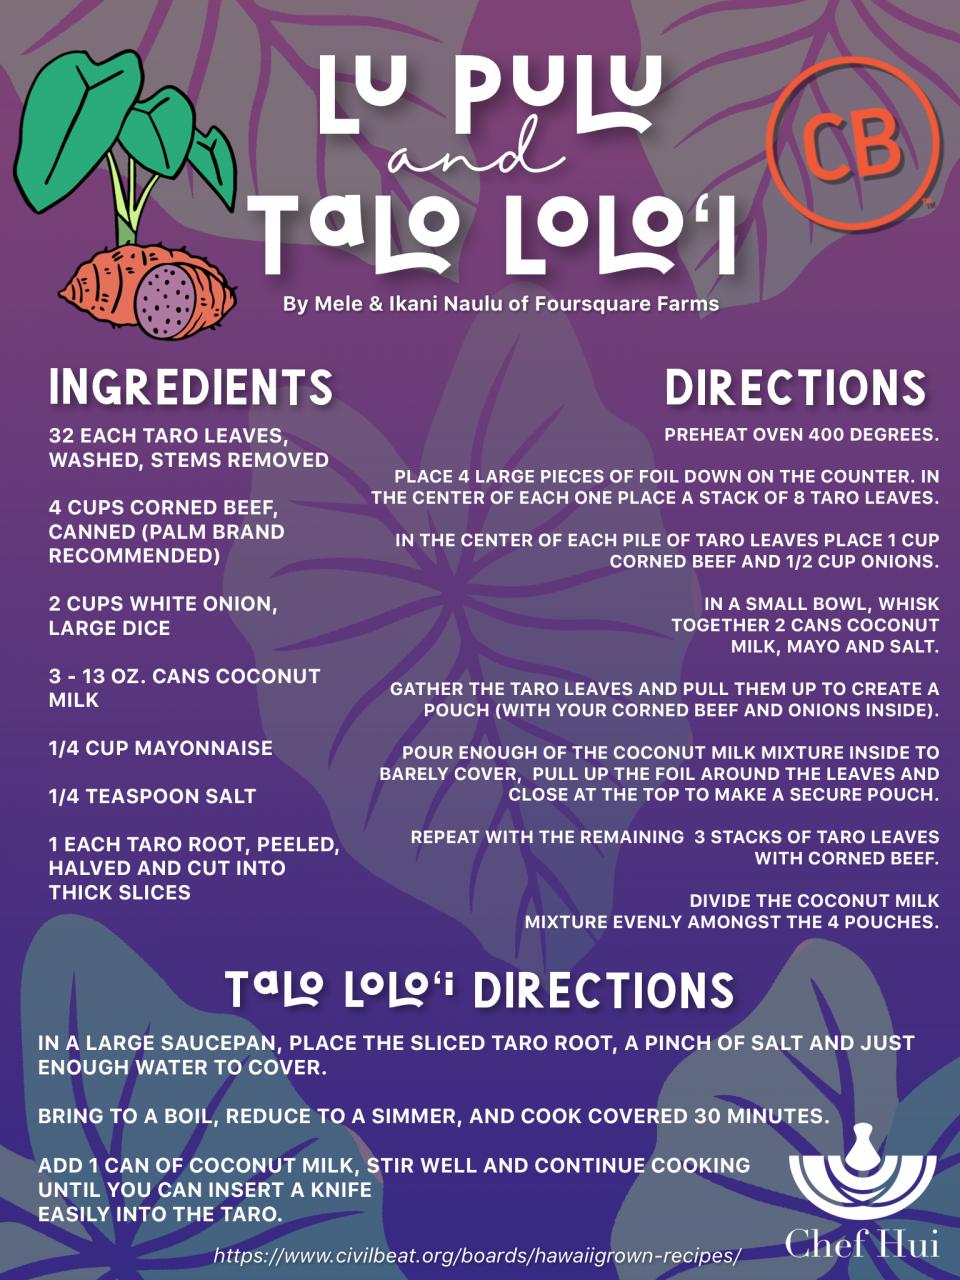 Lu Pulu with Talo Loloʻi from Chef Hui